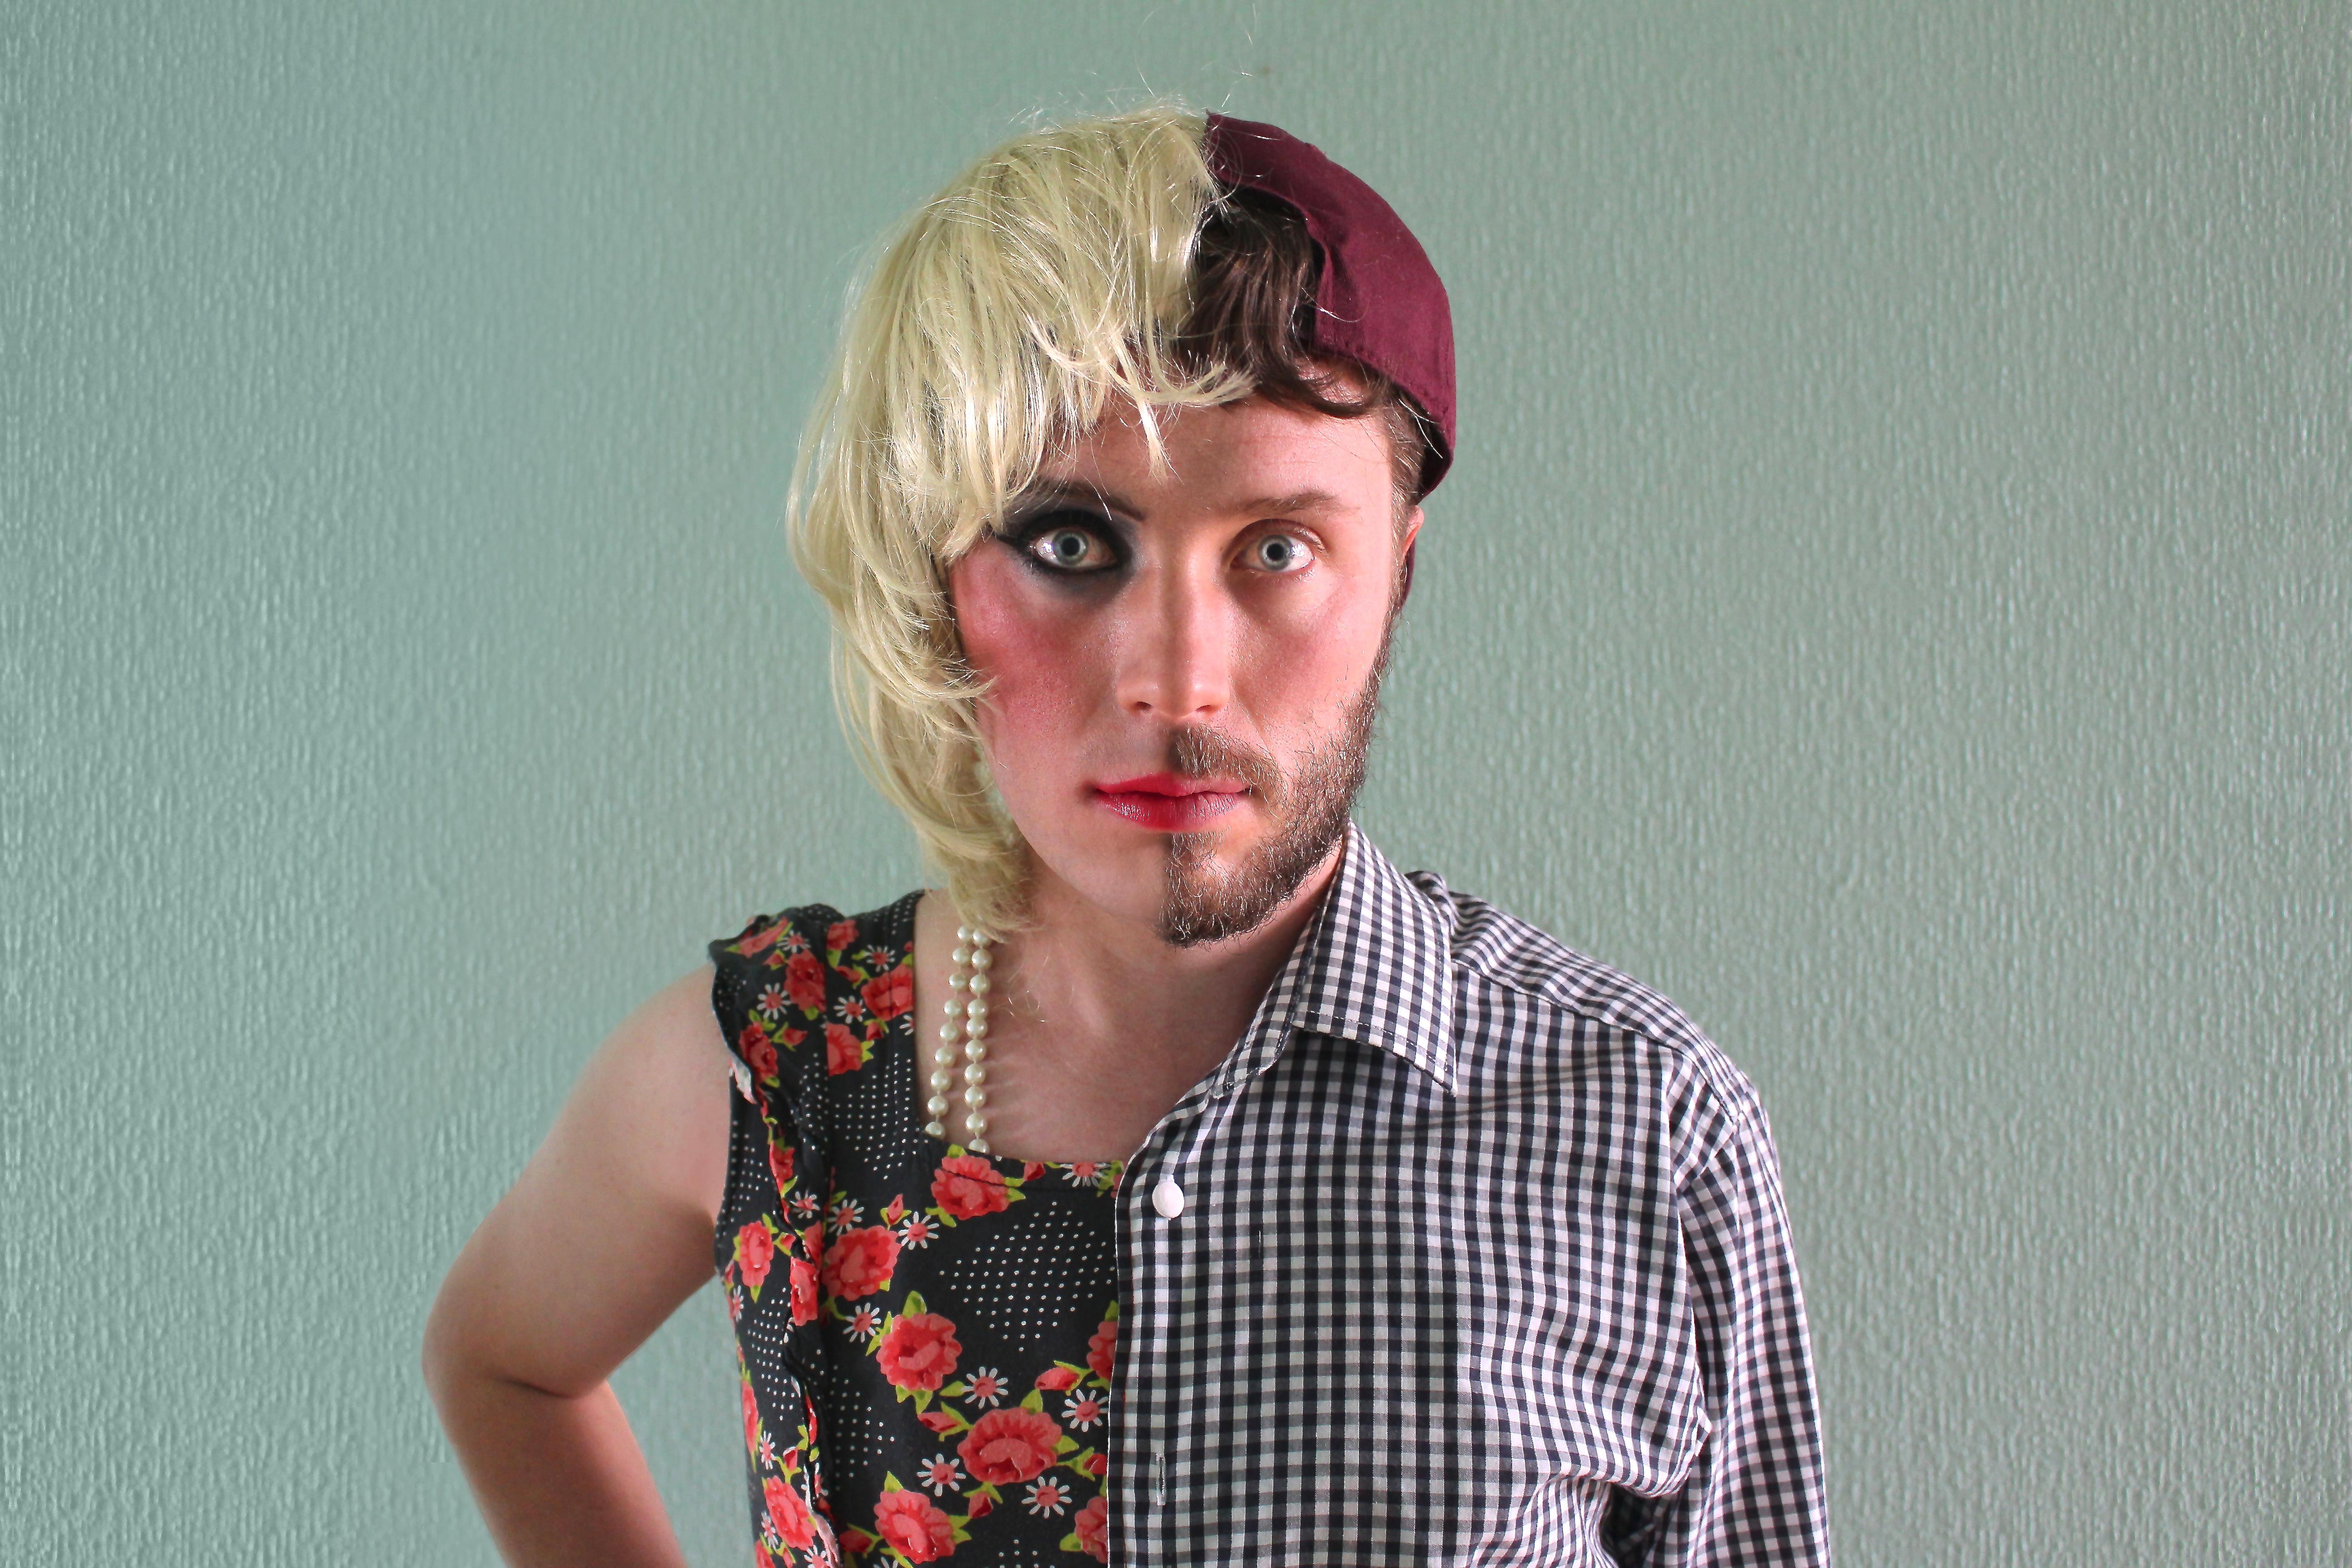 Half Man, Half Woman Hallowe'en Costume - David Galletly ... - photo#14